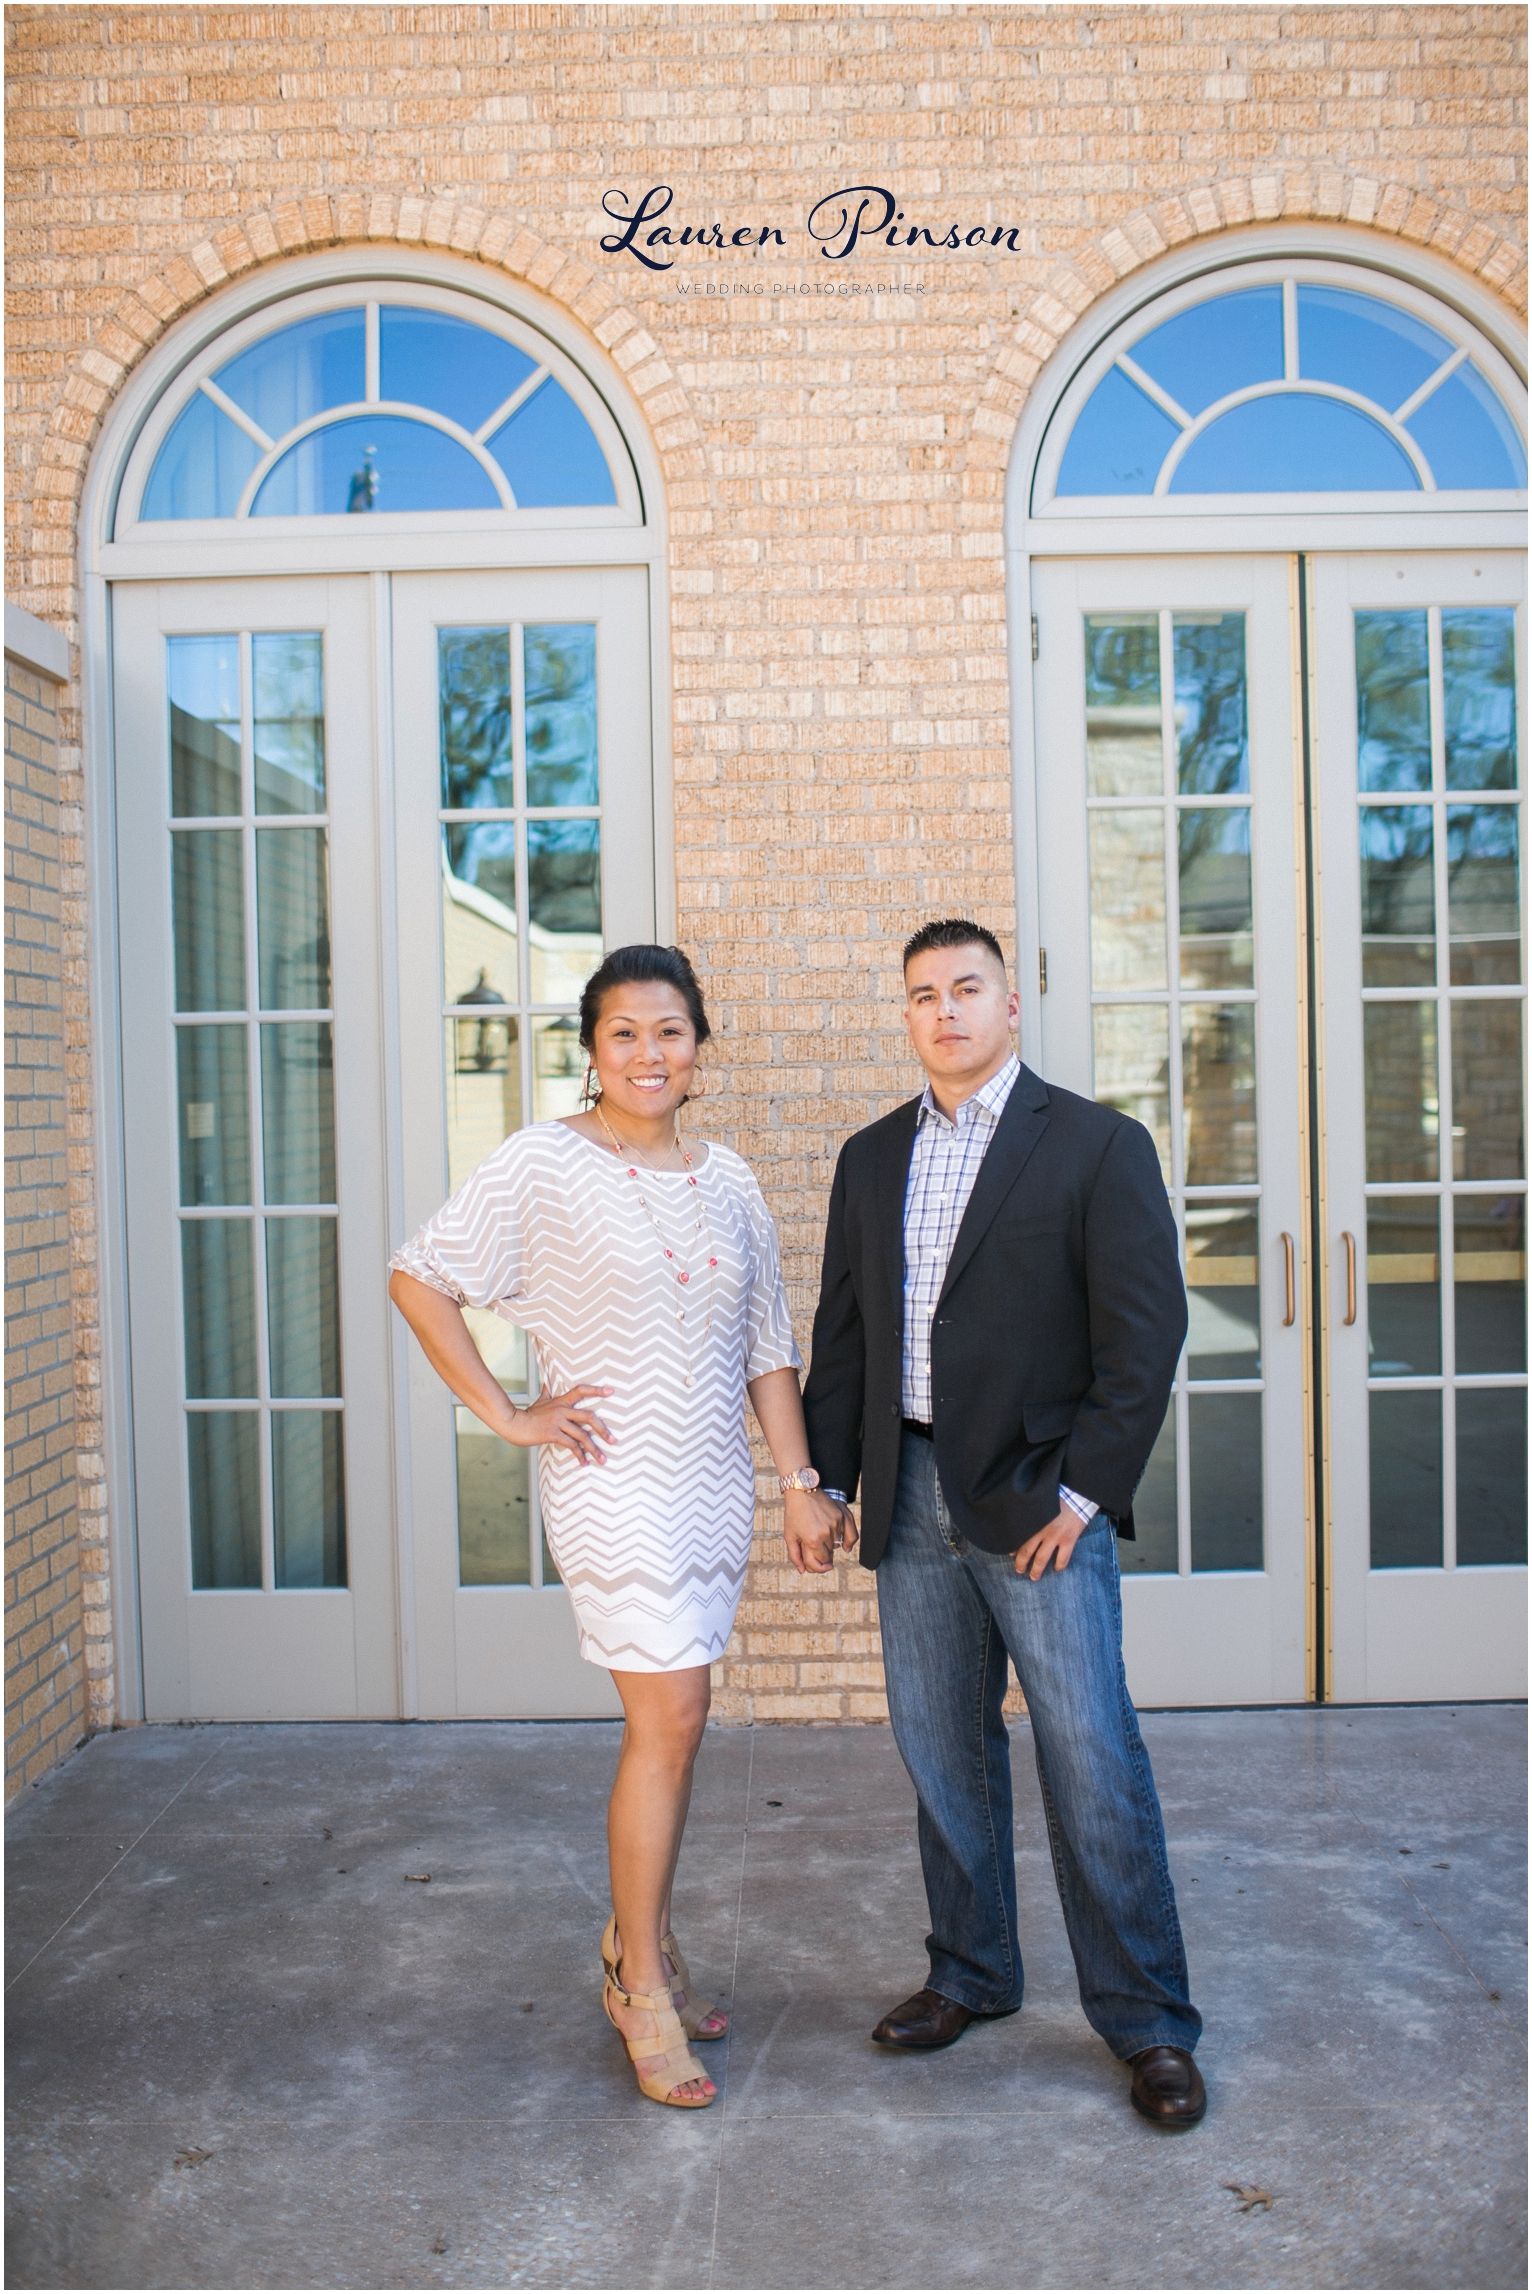 wichita-falls-wedding-photographer-engagement-session-texas-photography-oklahoma-engagement-wedding-photography_0603.jpg